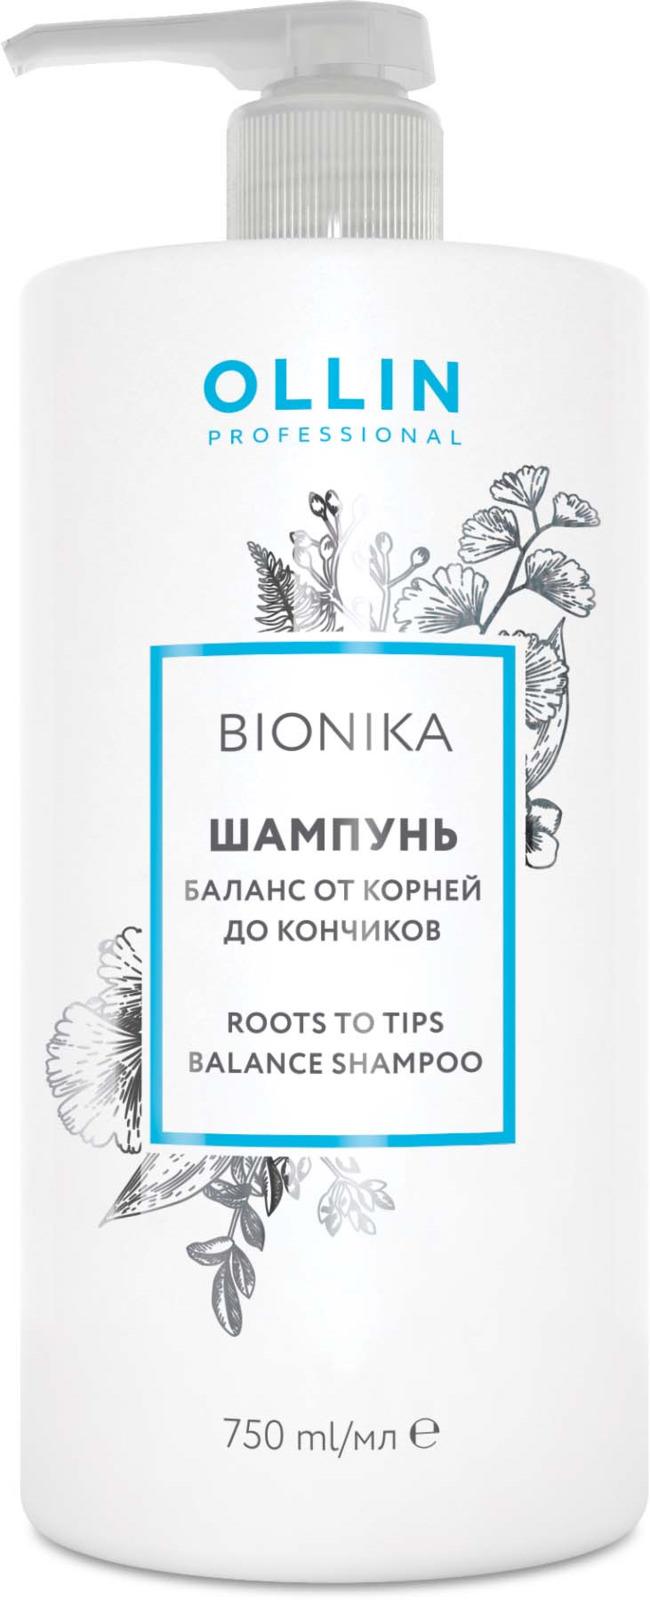 Ollin Шампунь Баланс от корней до кончиков BioNika Roots To Tips Balance Shampoo 750 мл